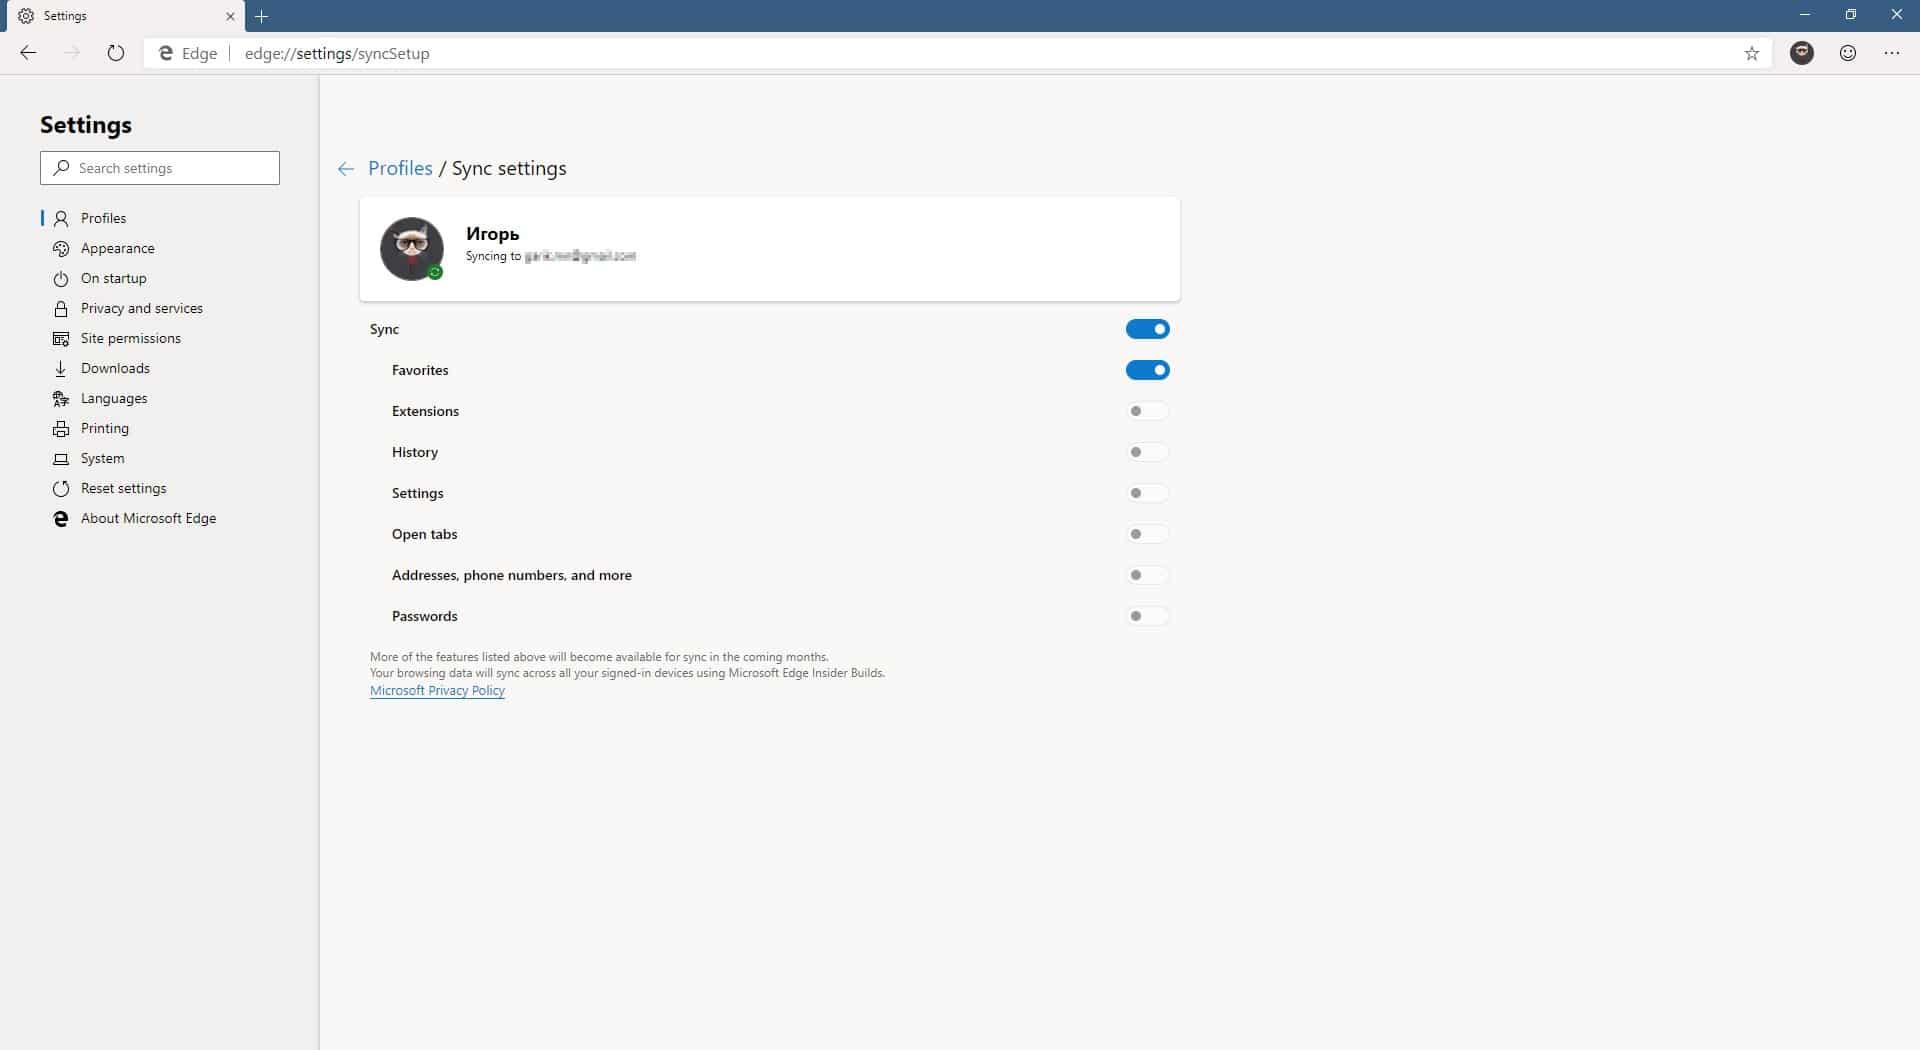 Браузер Edge на Chromium: у Microsoft теперь есть свой